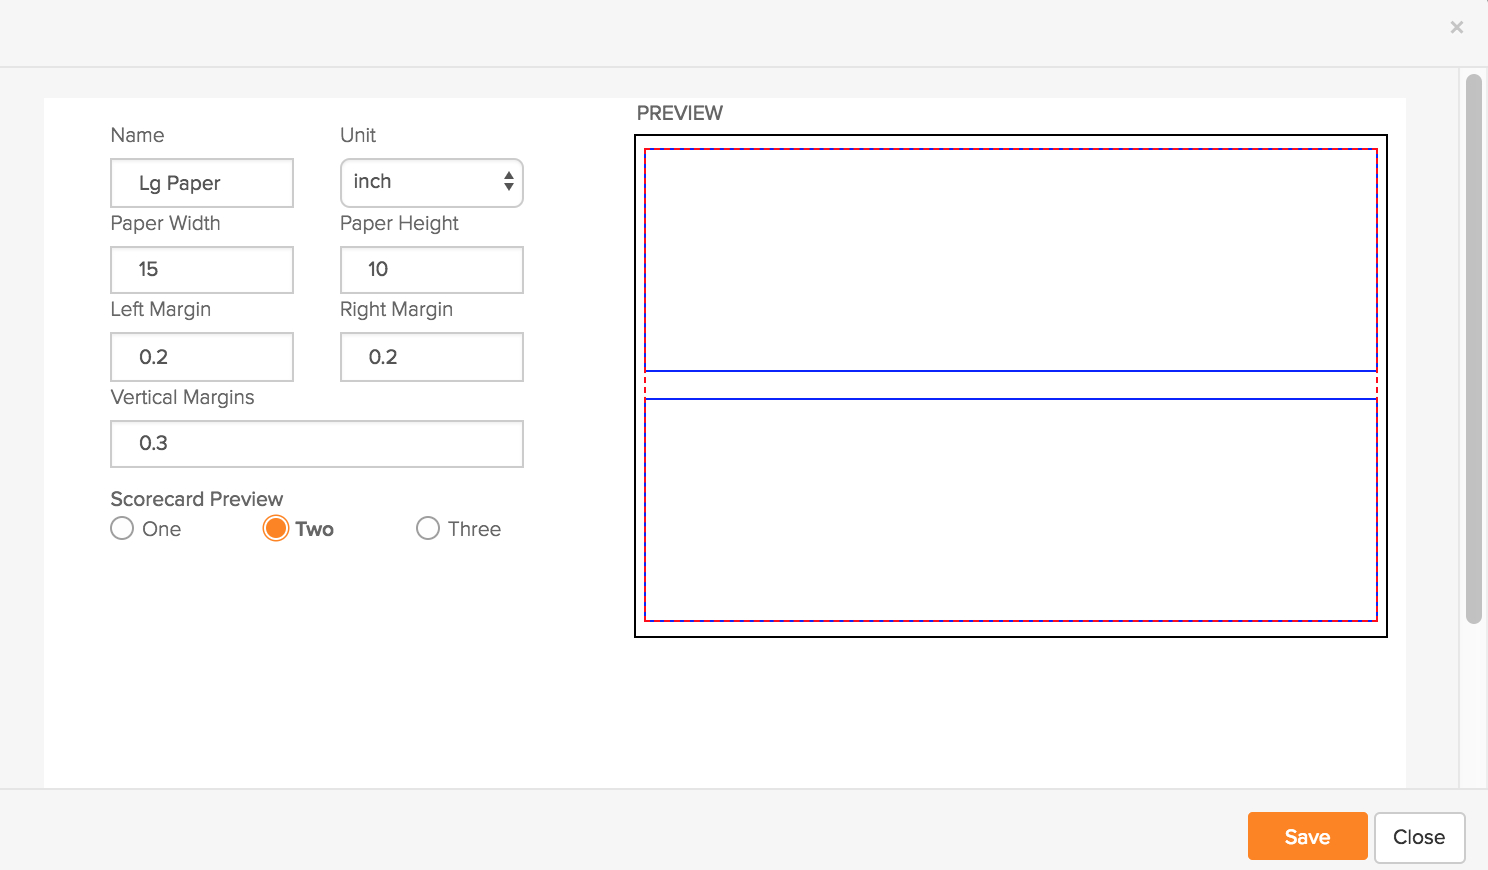 Golf Handicap Spreadsheet Free Within Golfgenius  Printing Scorecards Format Tab